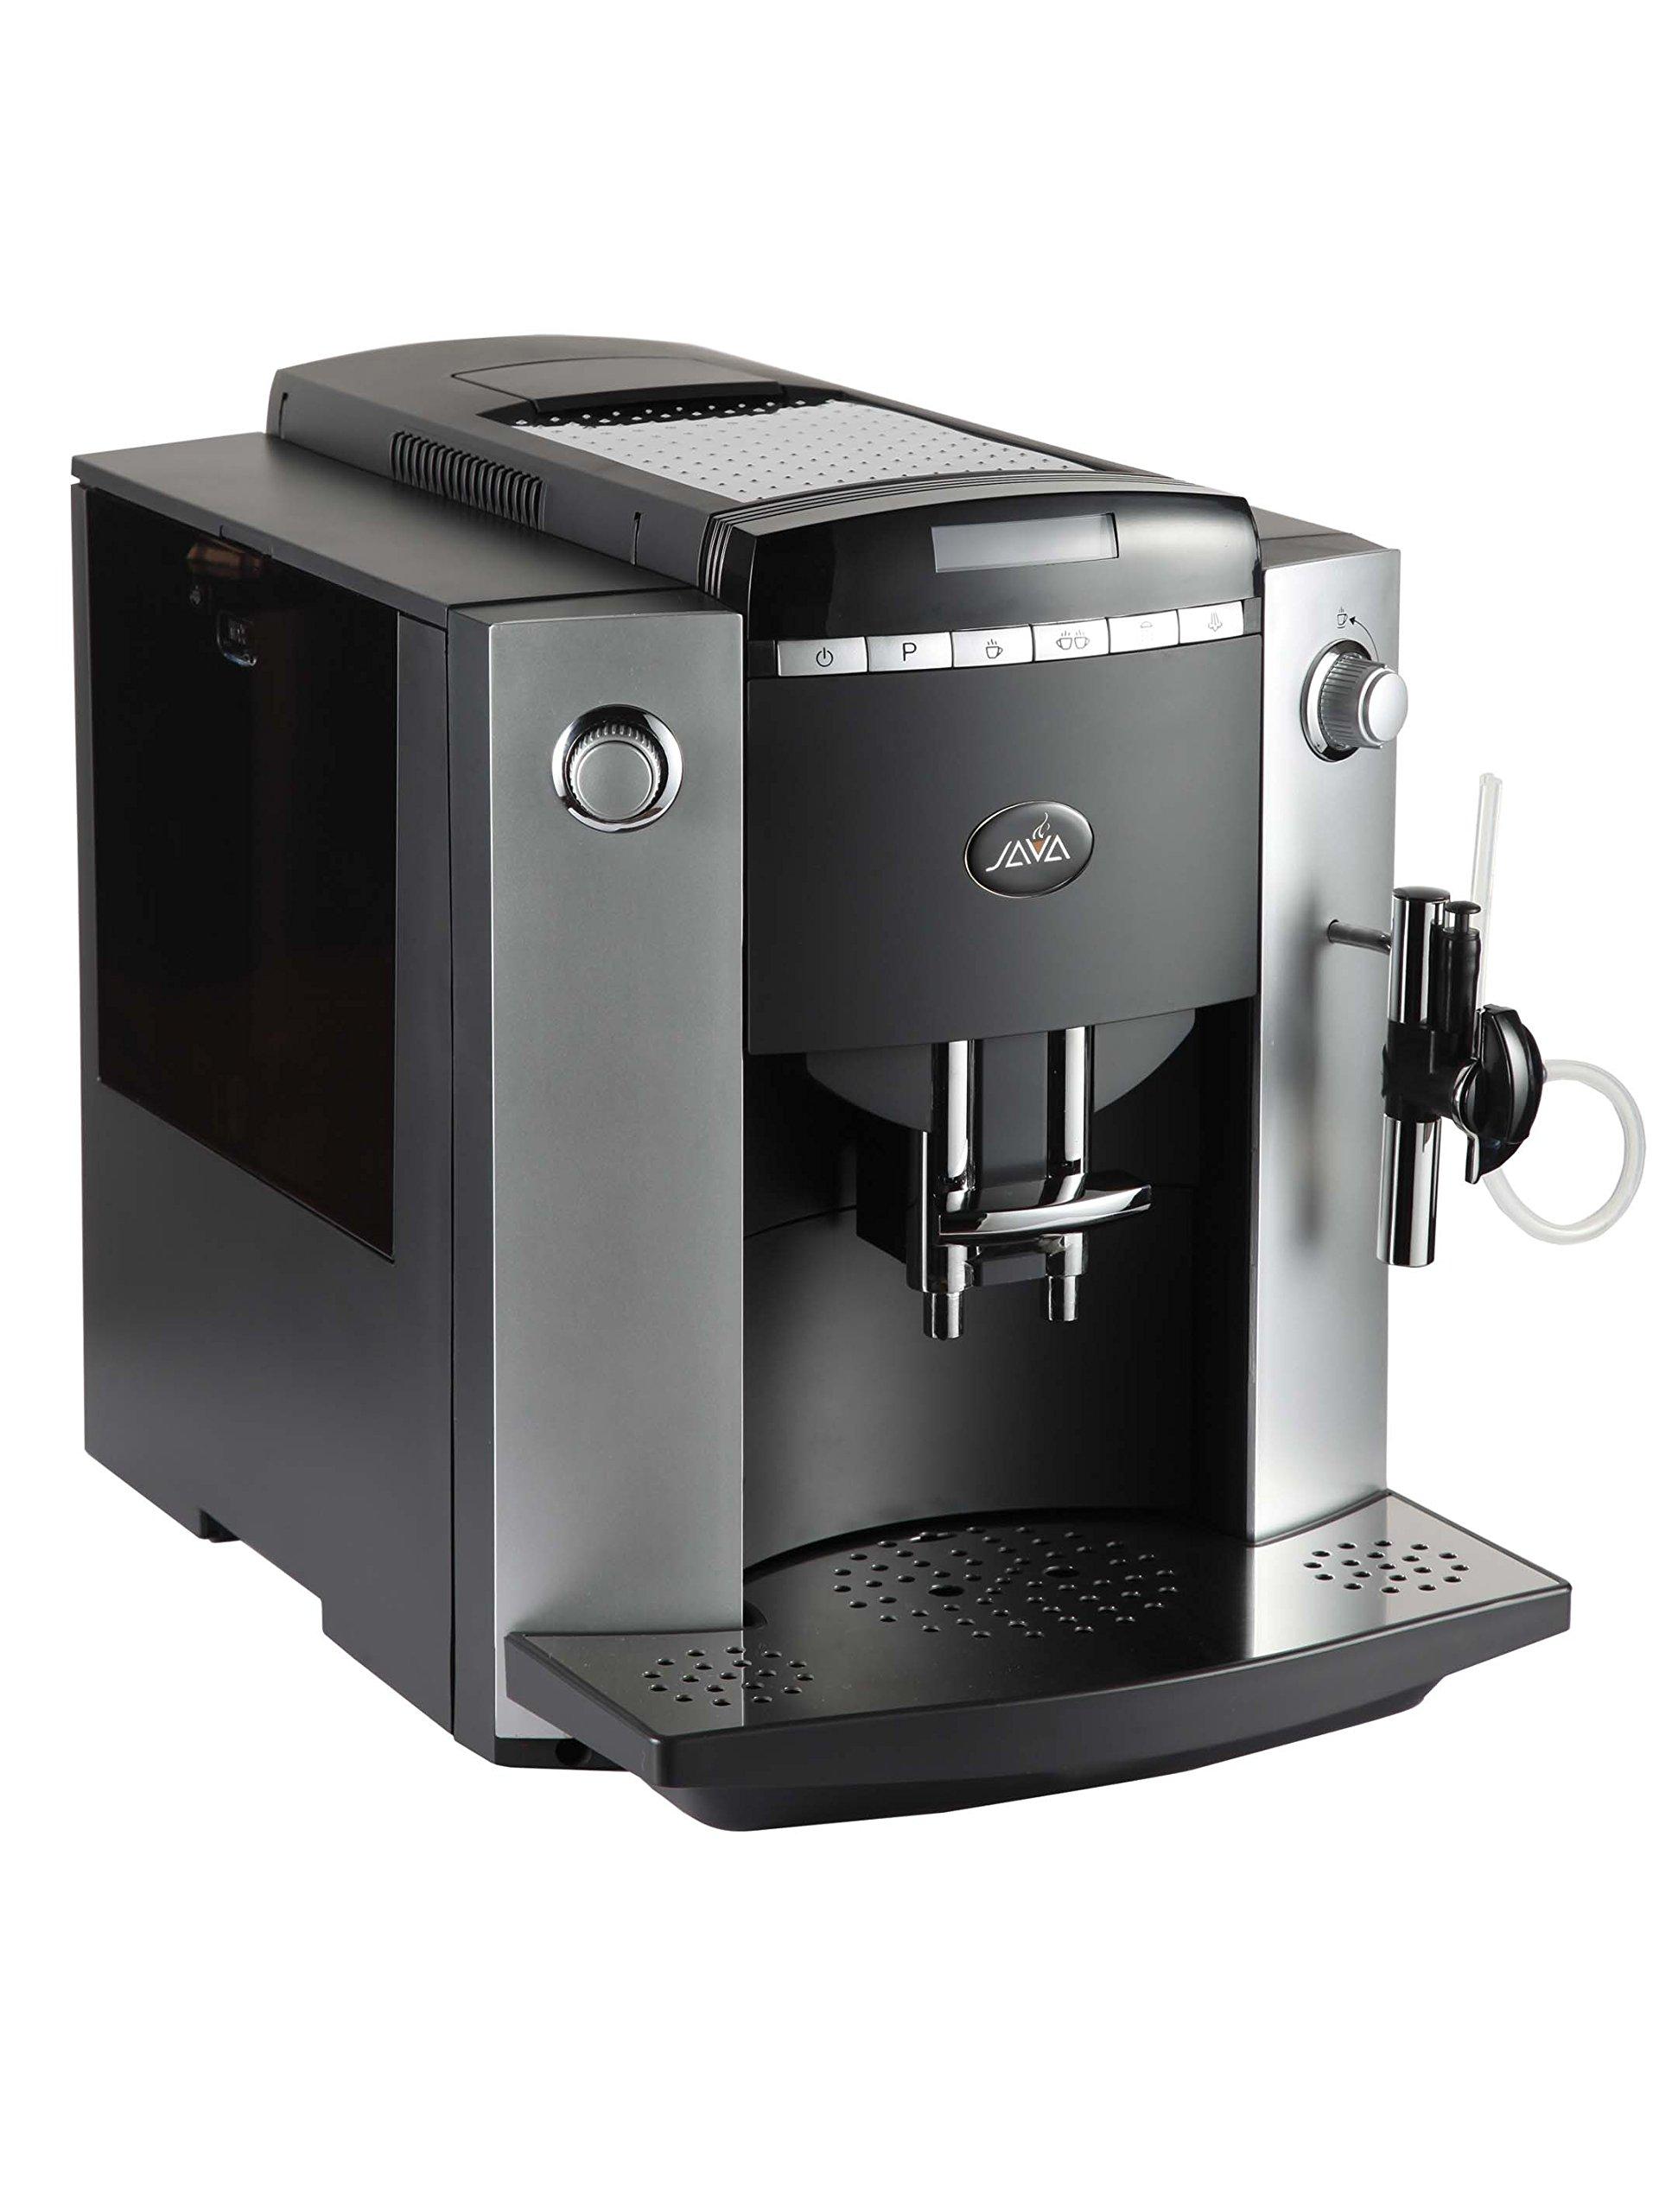 Omcan 21602 Restaurant Automatic Espresso Coffee Machine w/ brewing and grinder